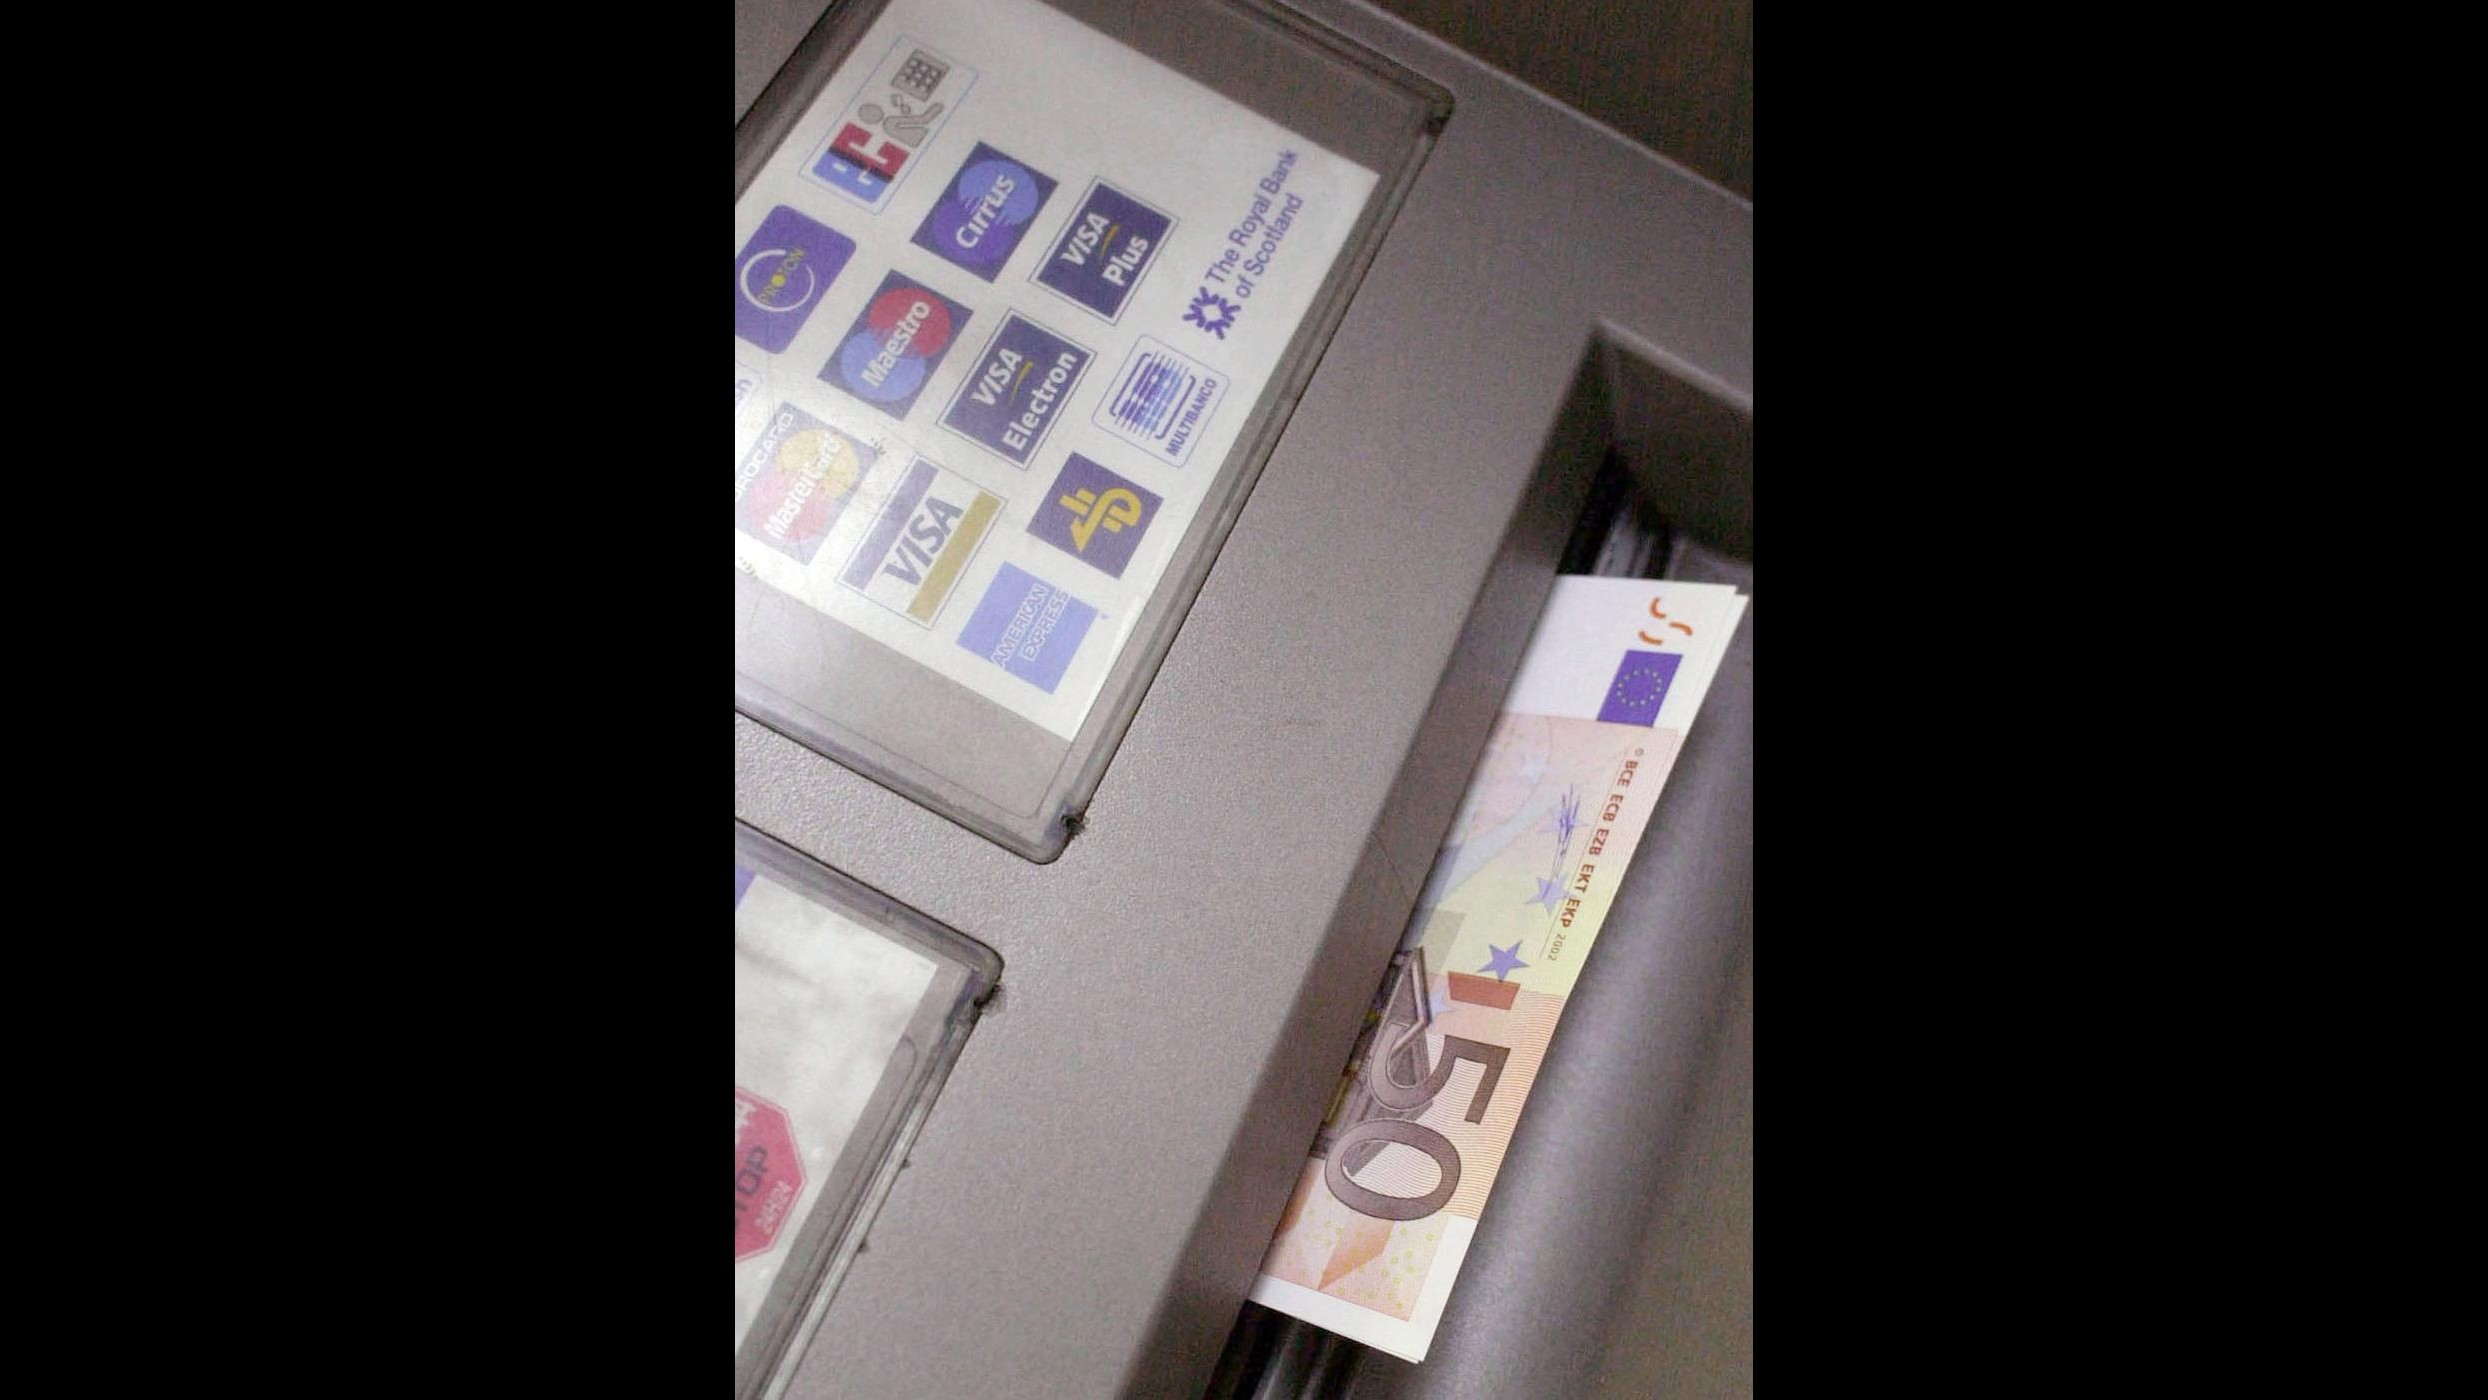 Carte clonate, operazione polizia: tra arresti bancario infedele